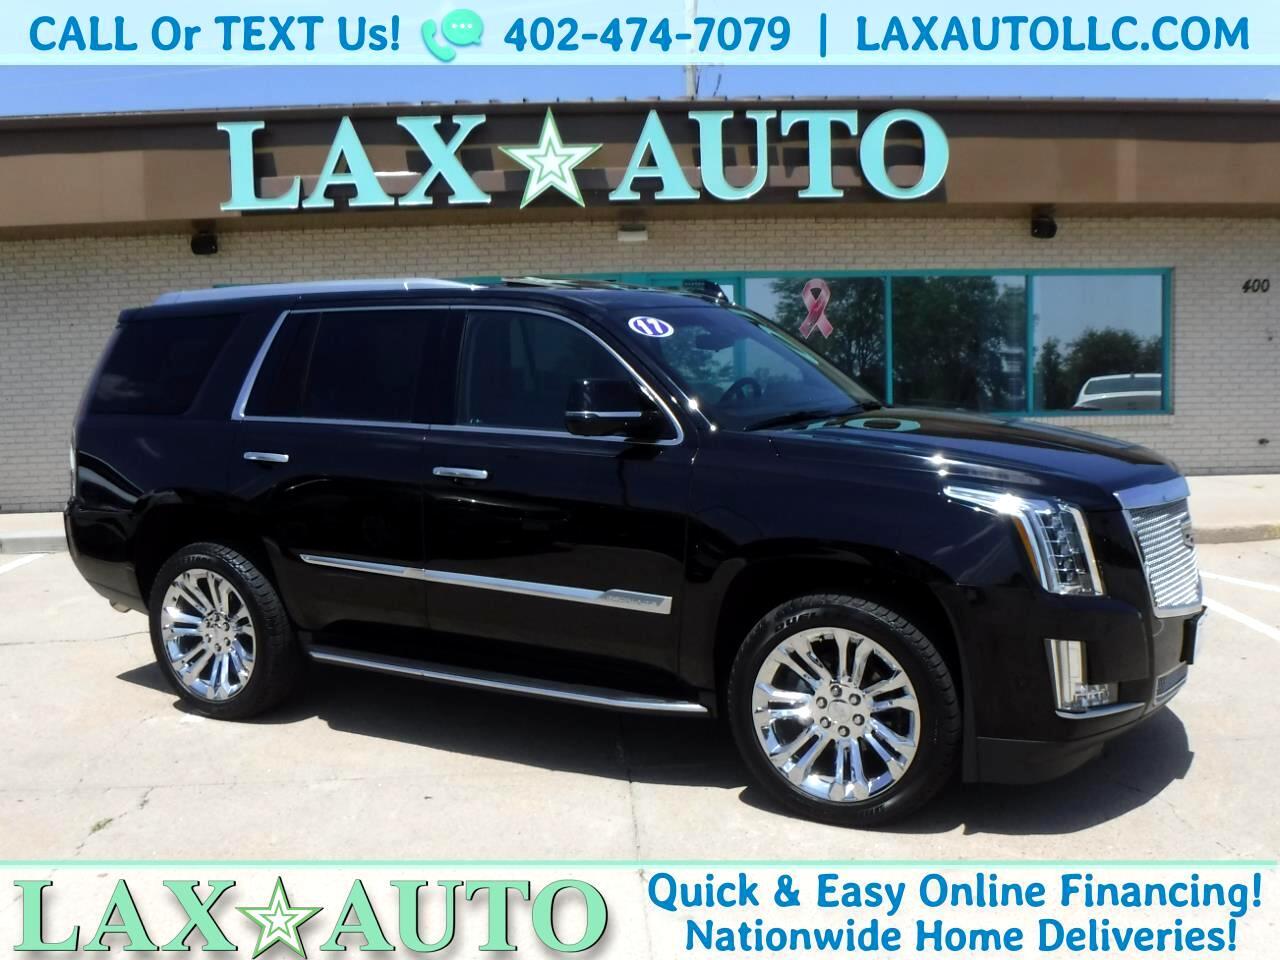 2017 Cadillac Escalade Luxury w/ Only 2,421 Miles! Navi! Bose Sound!